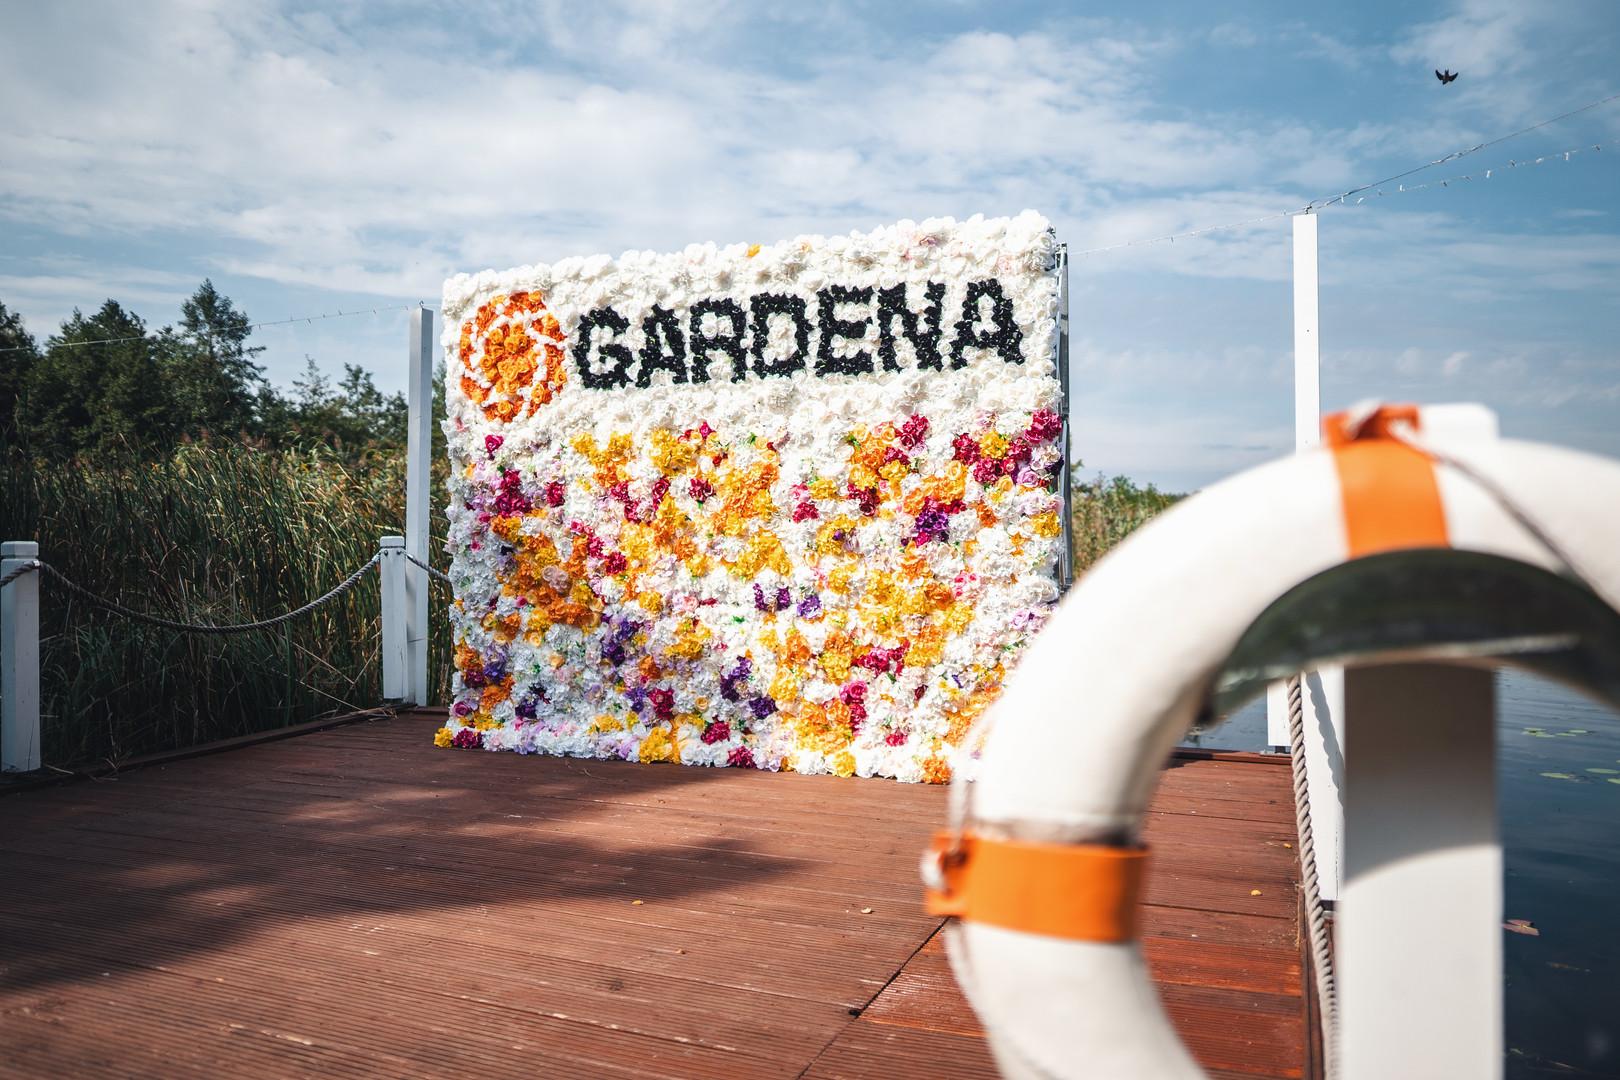 Gardena2019-09-01_12-29-33.jpeg